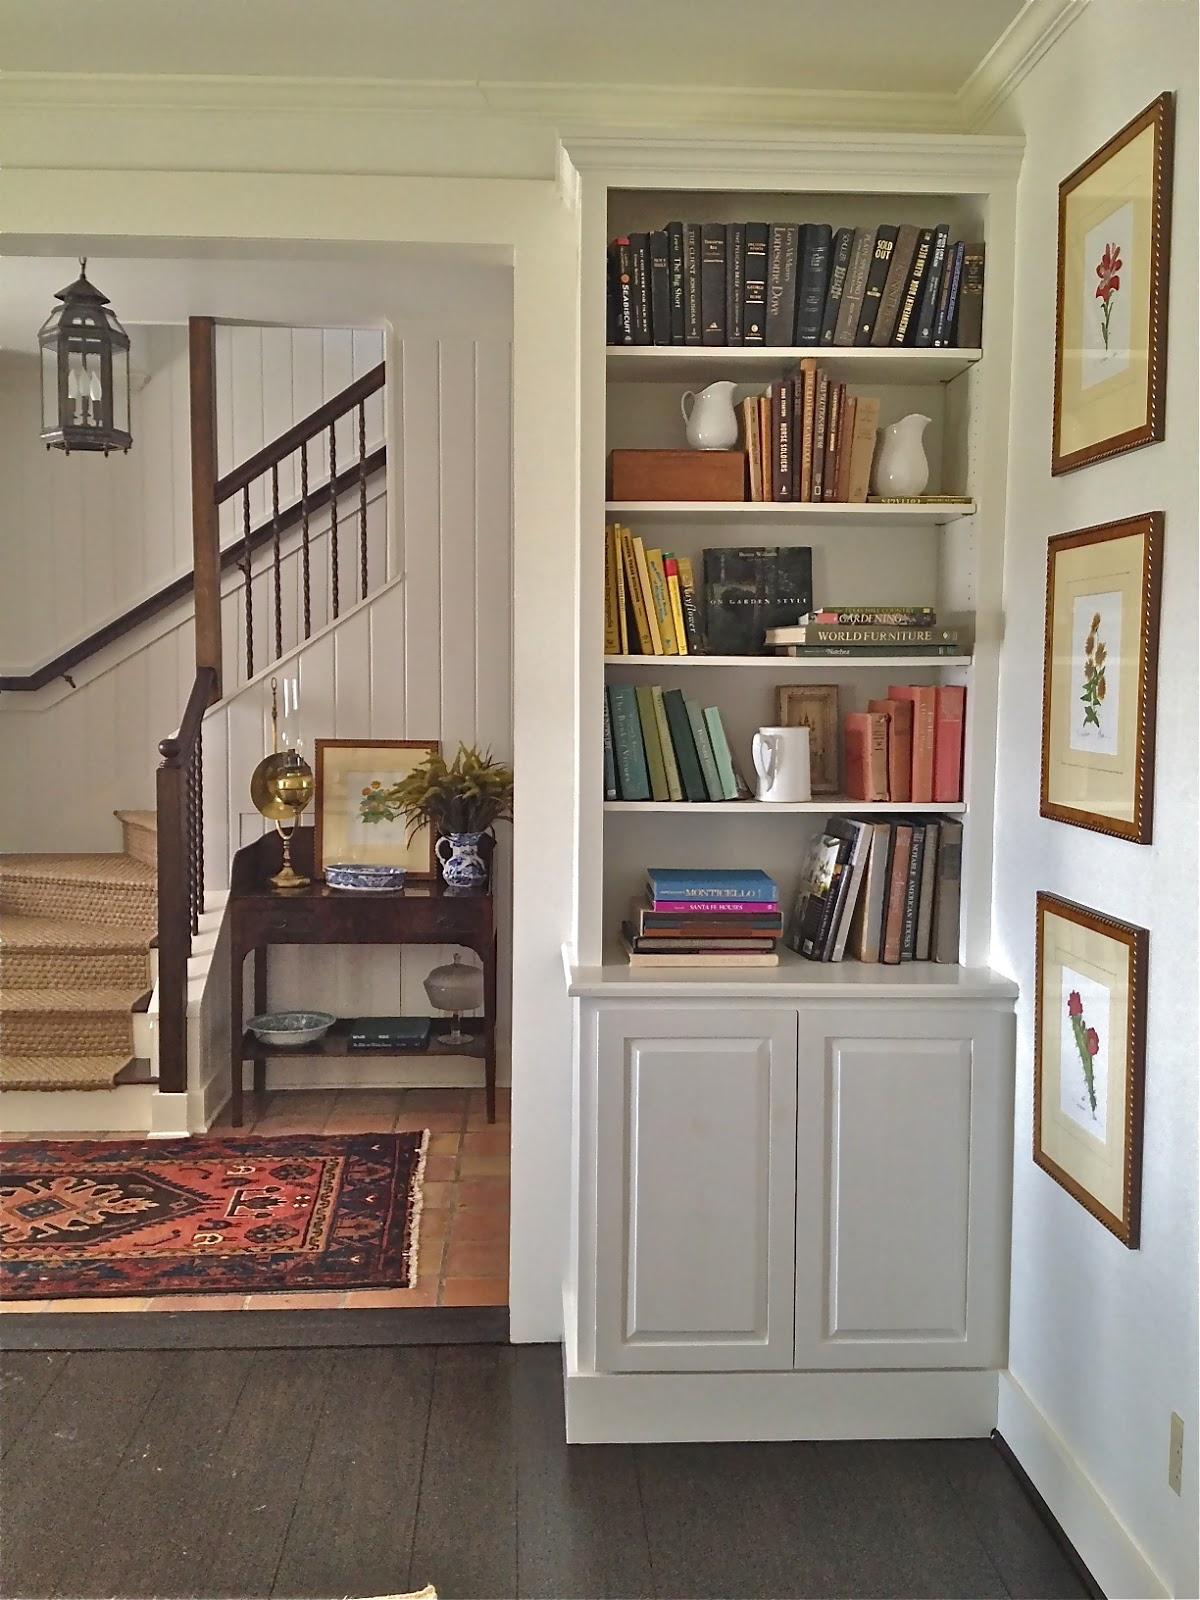 Meredith Ellis Design Post Spotlight On Interior